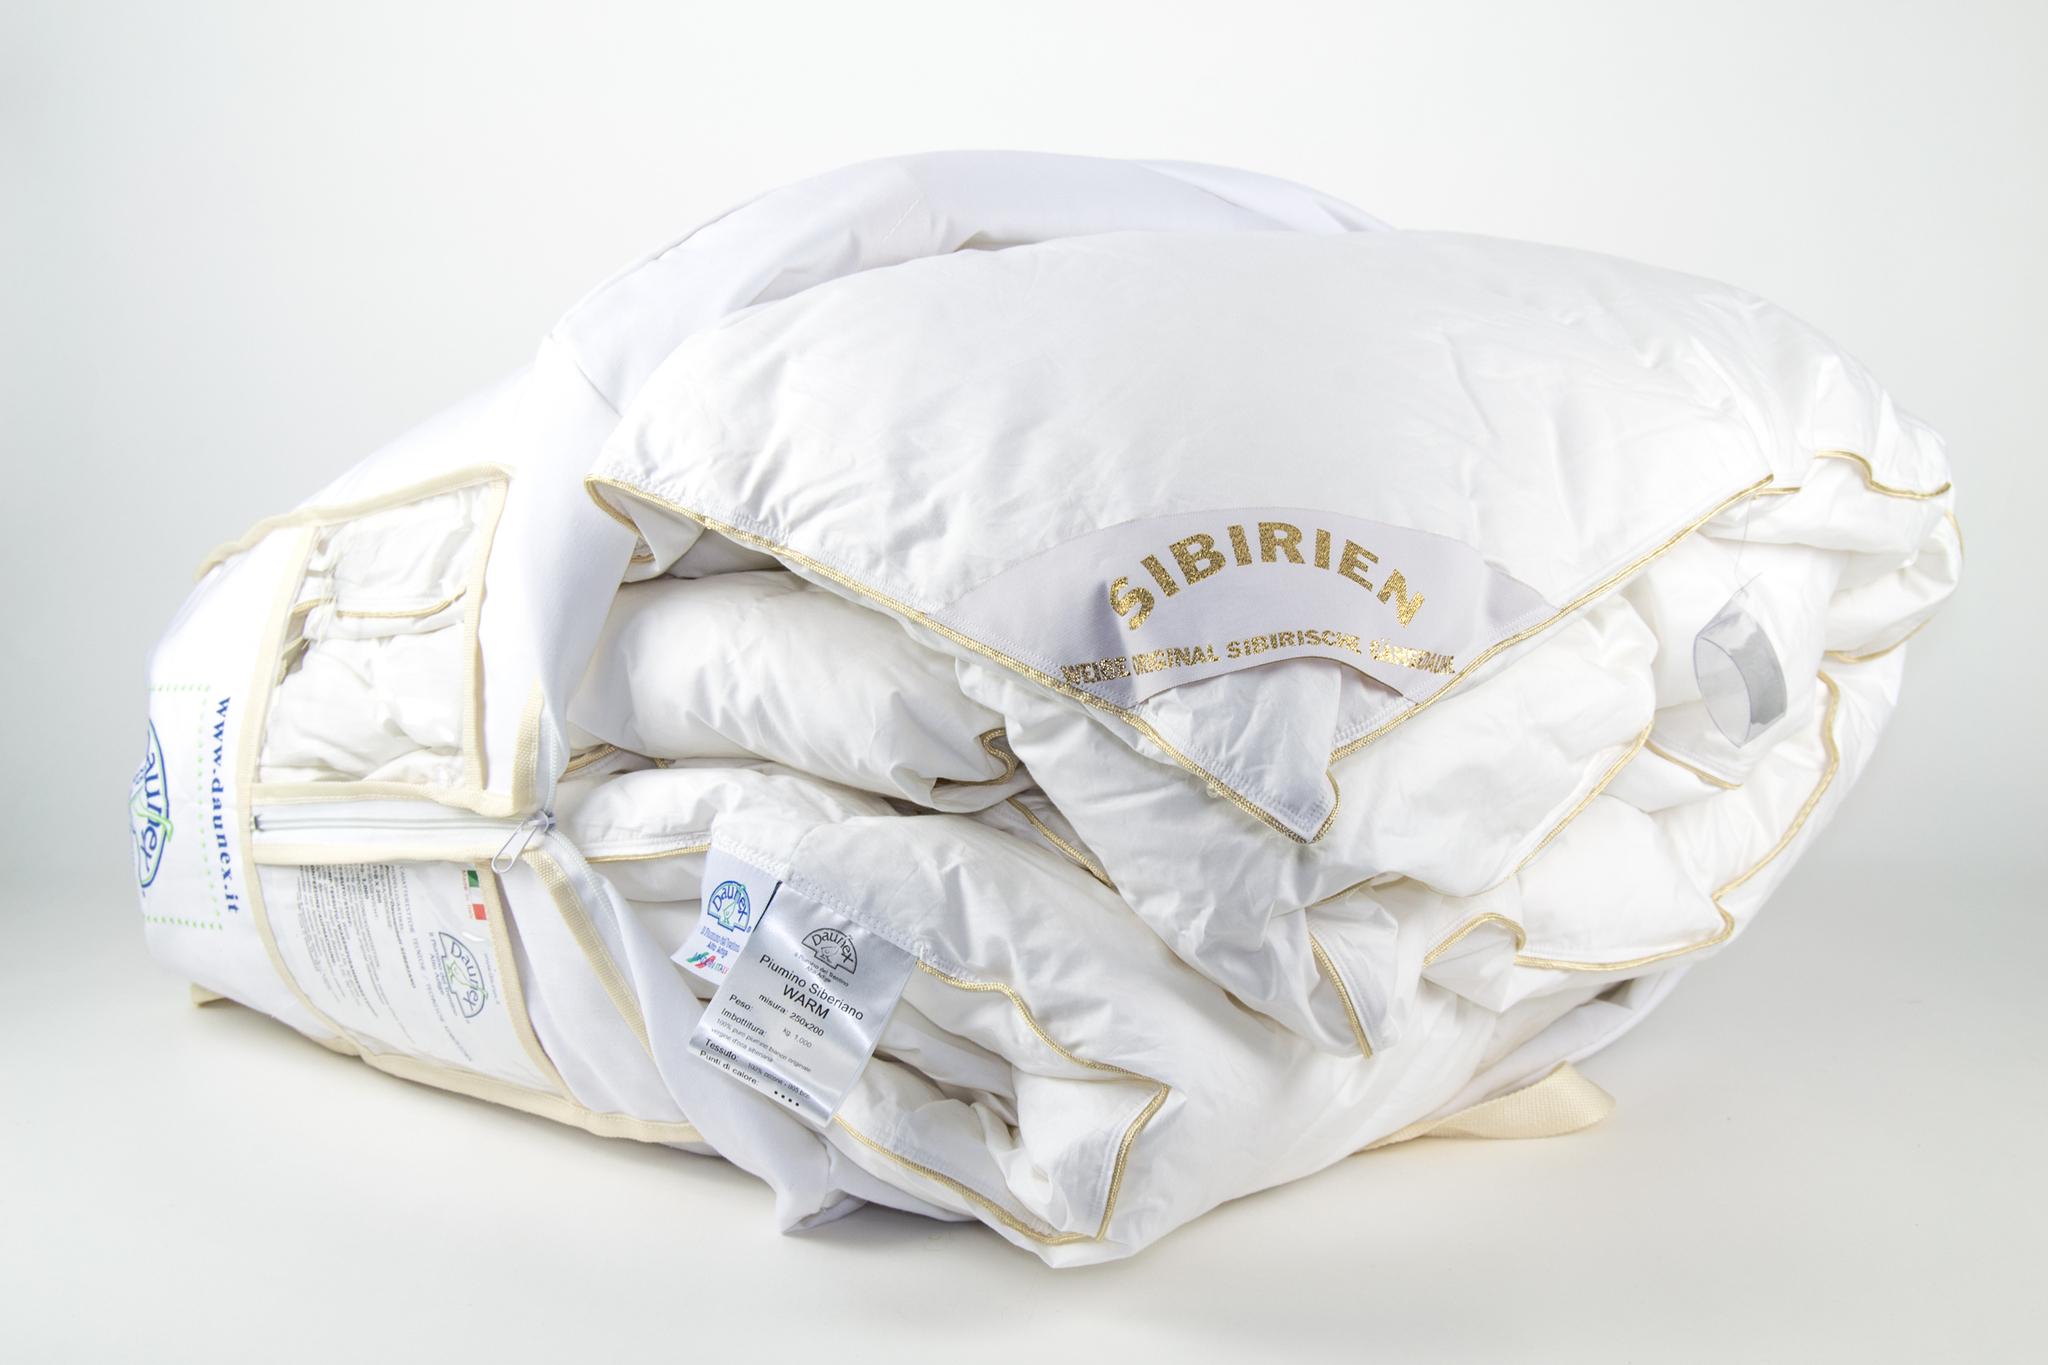 Одеяла Элитное одеяло пуховое 200х200 Siberiano от Daunex elitnoe-odeyalo-puhovoe-200h200-siberiano-ot-daunex-italiya.jpg